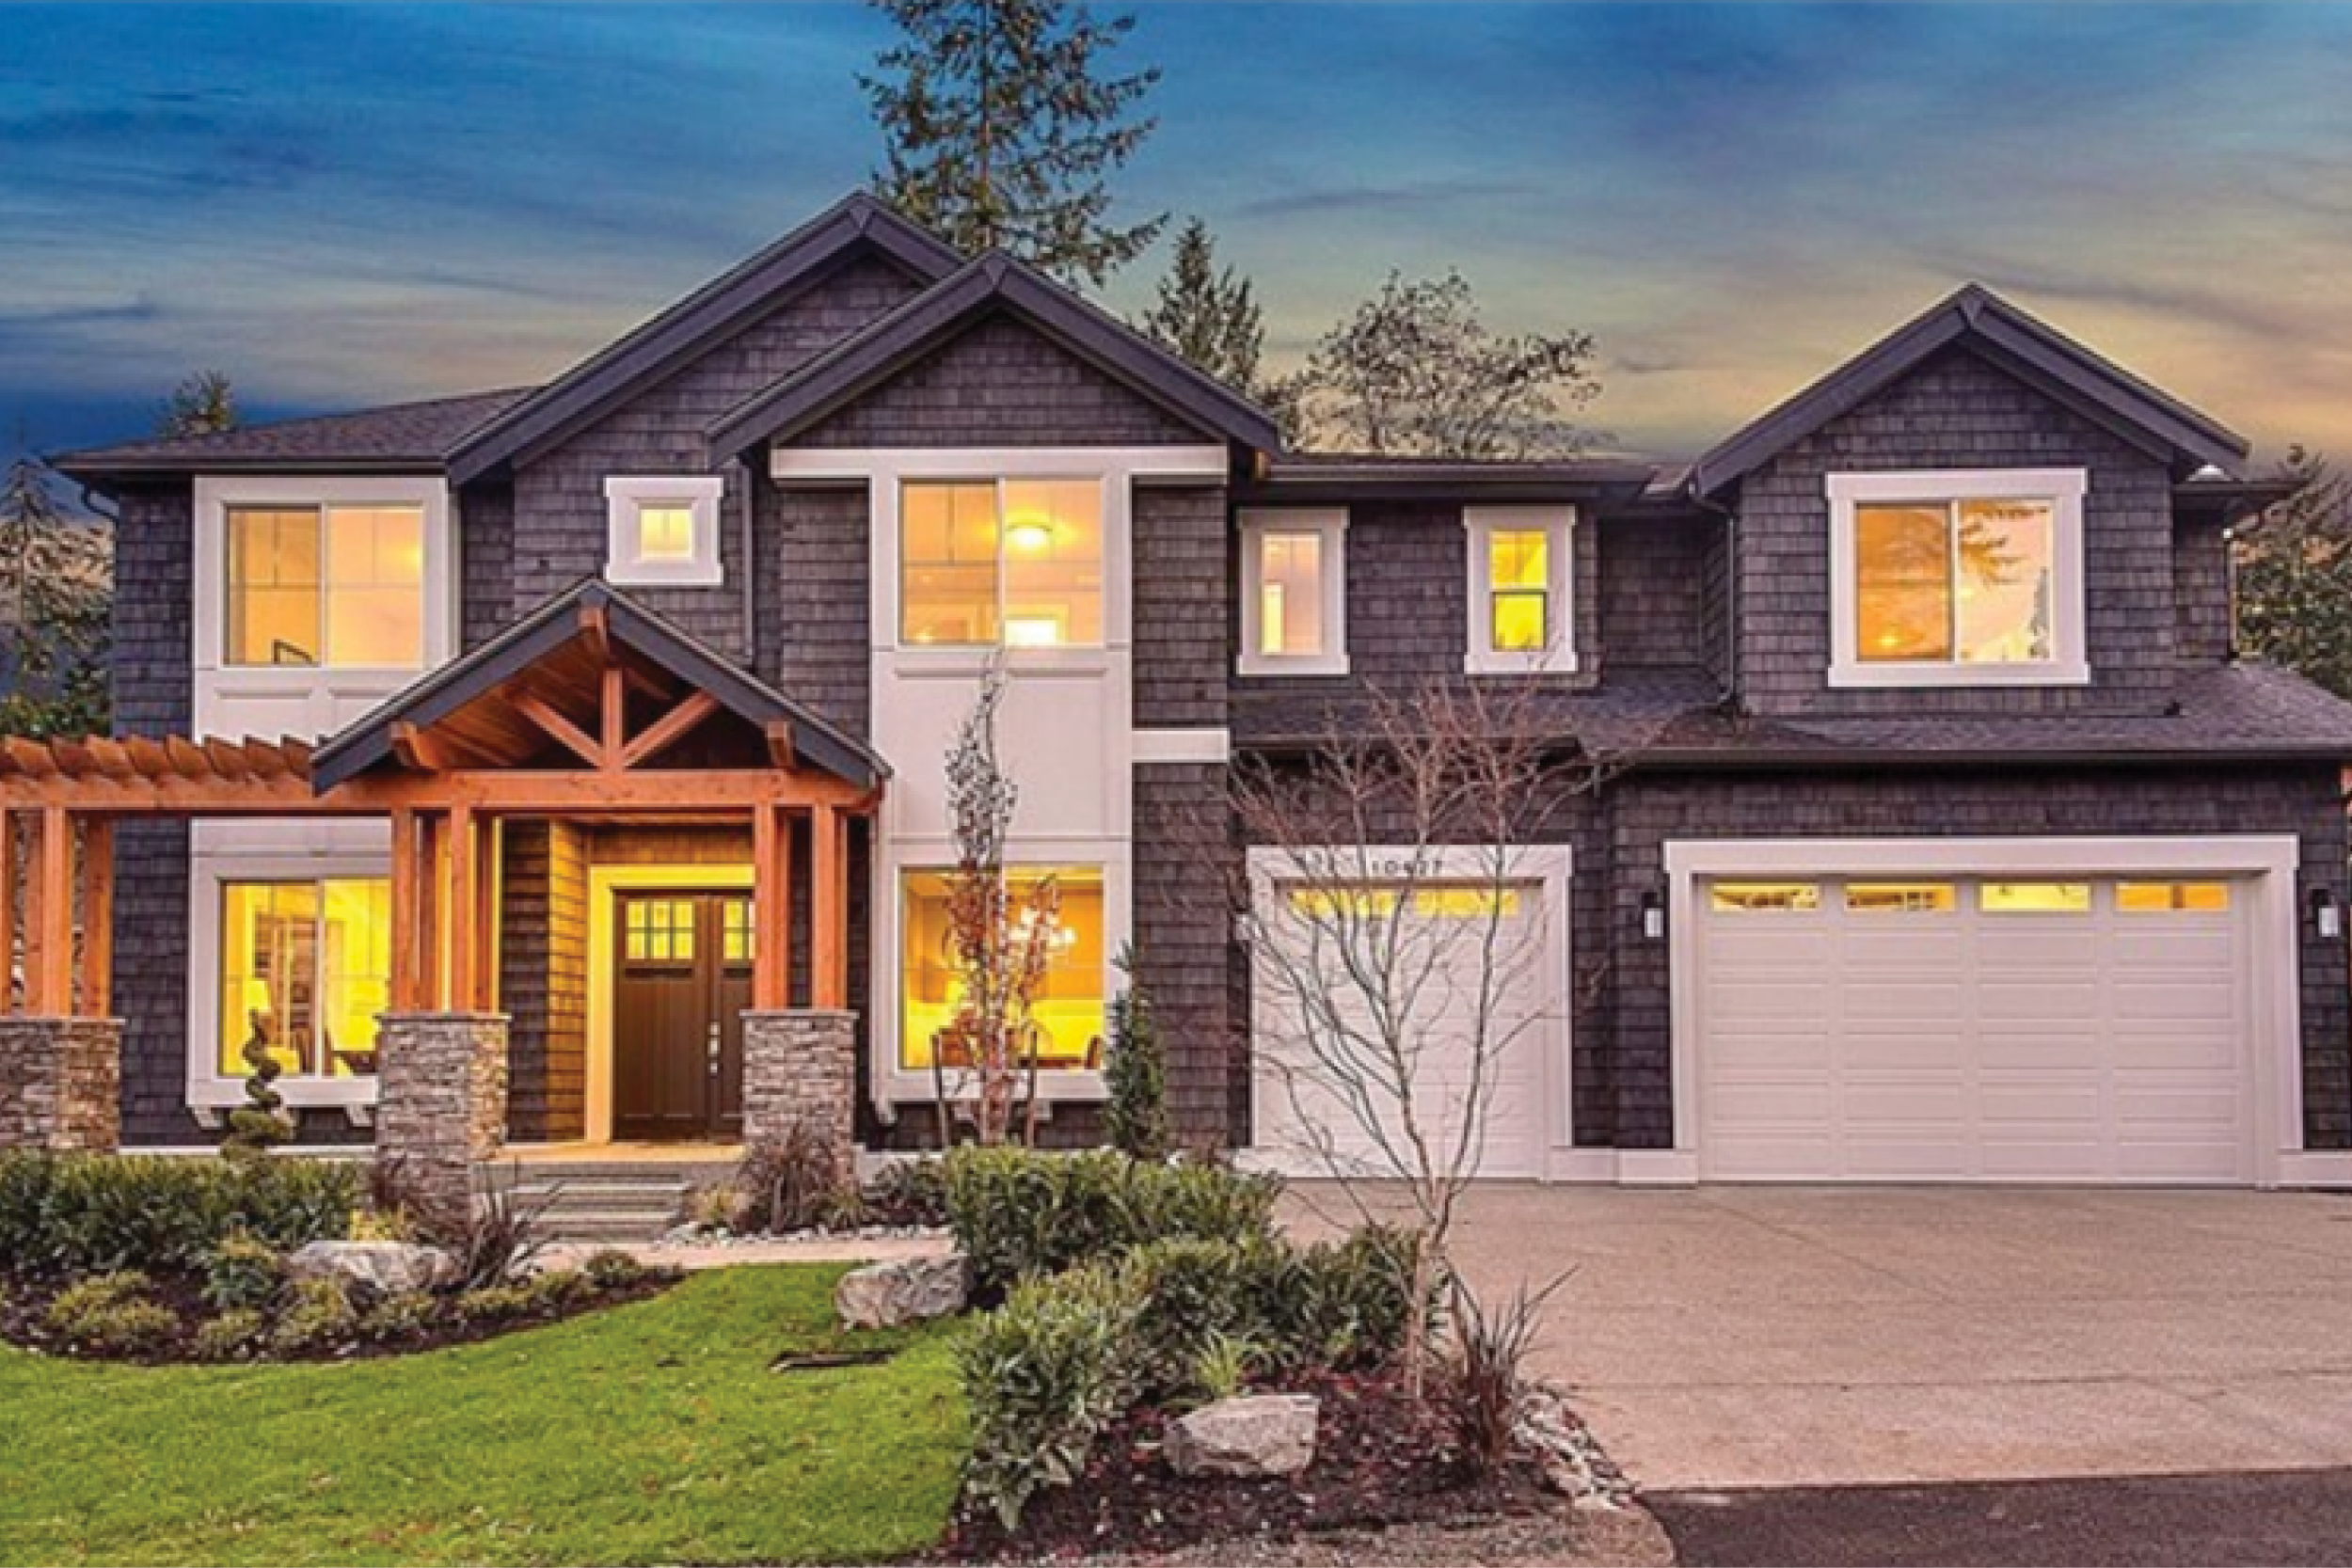 West Bellevue    Sold for $1,360,000 June 2017